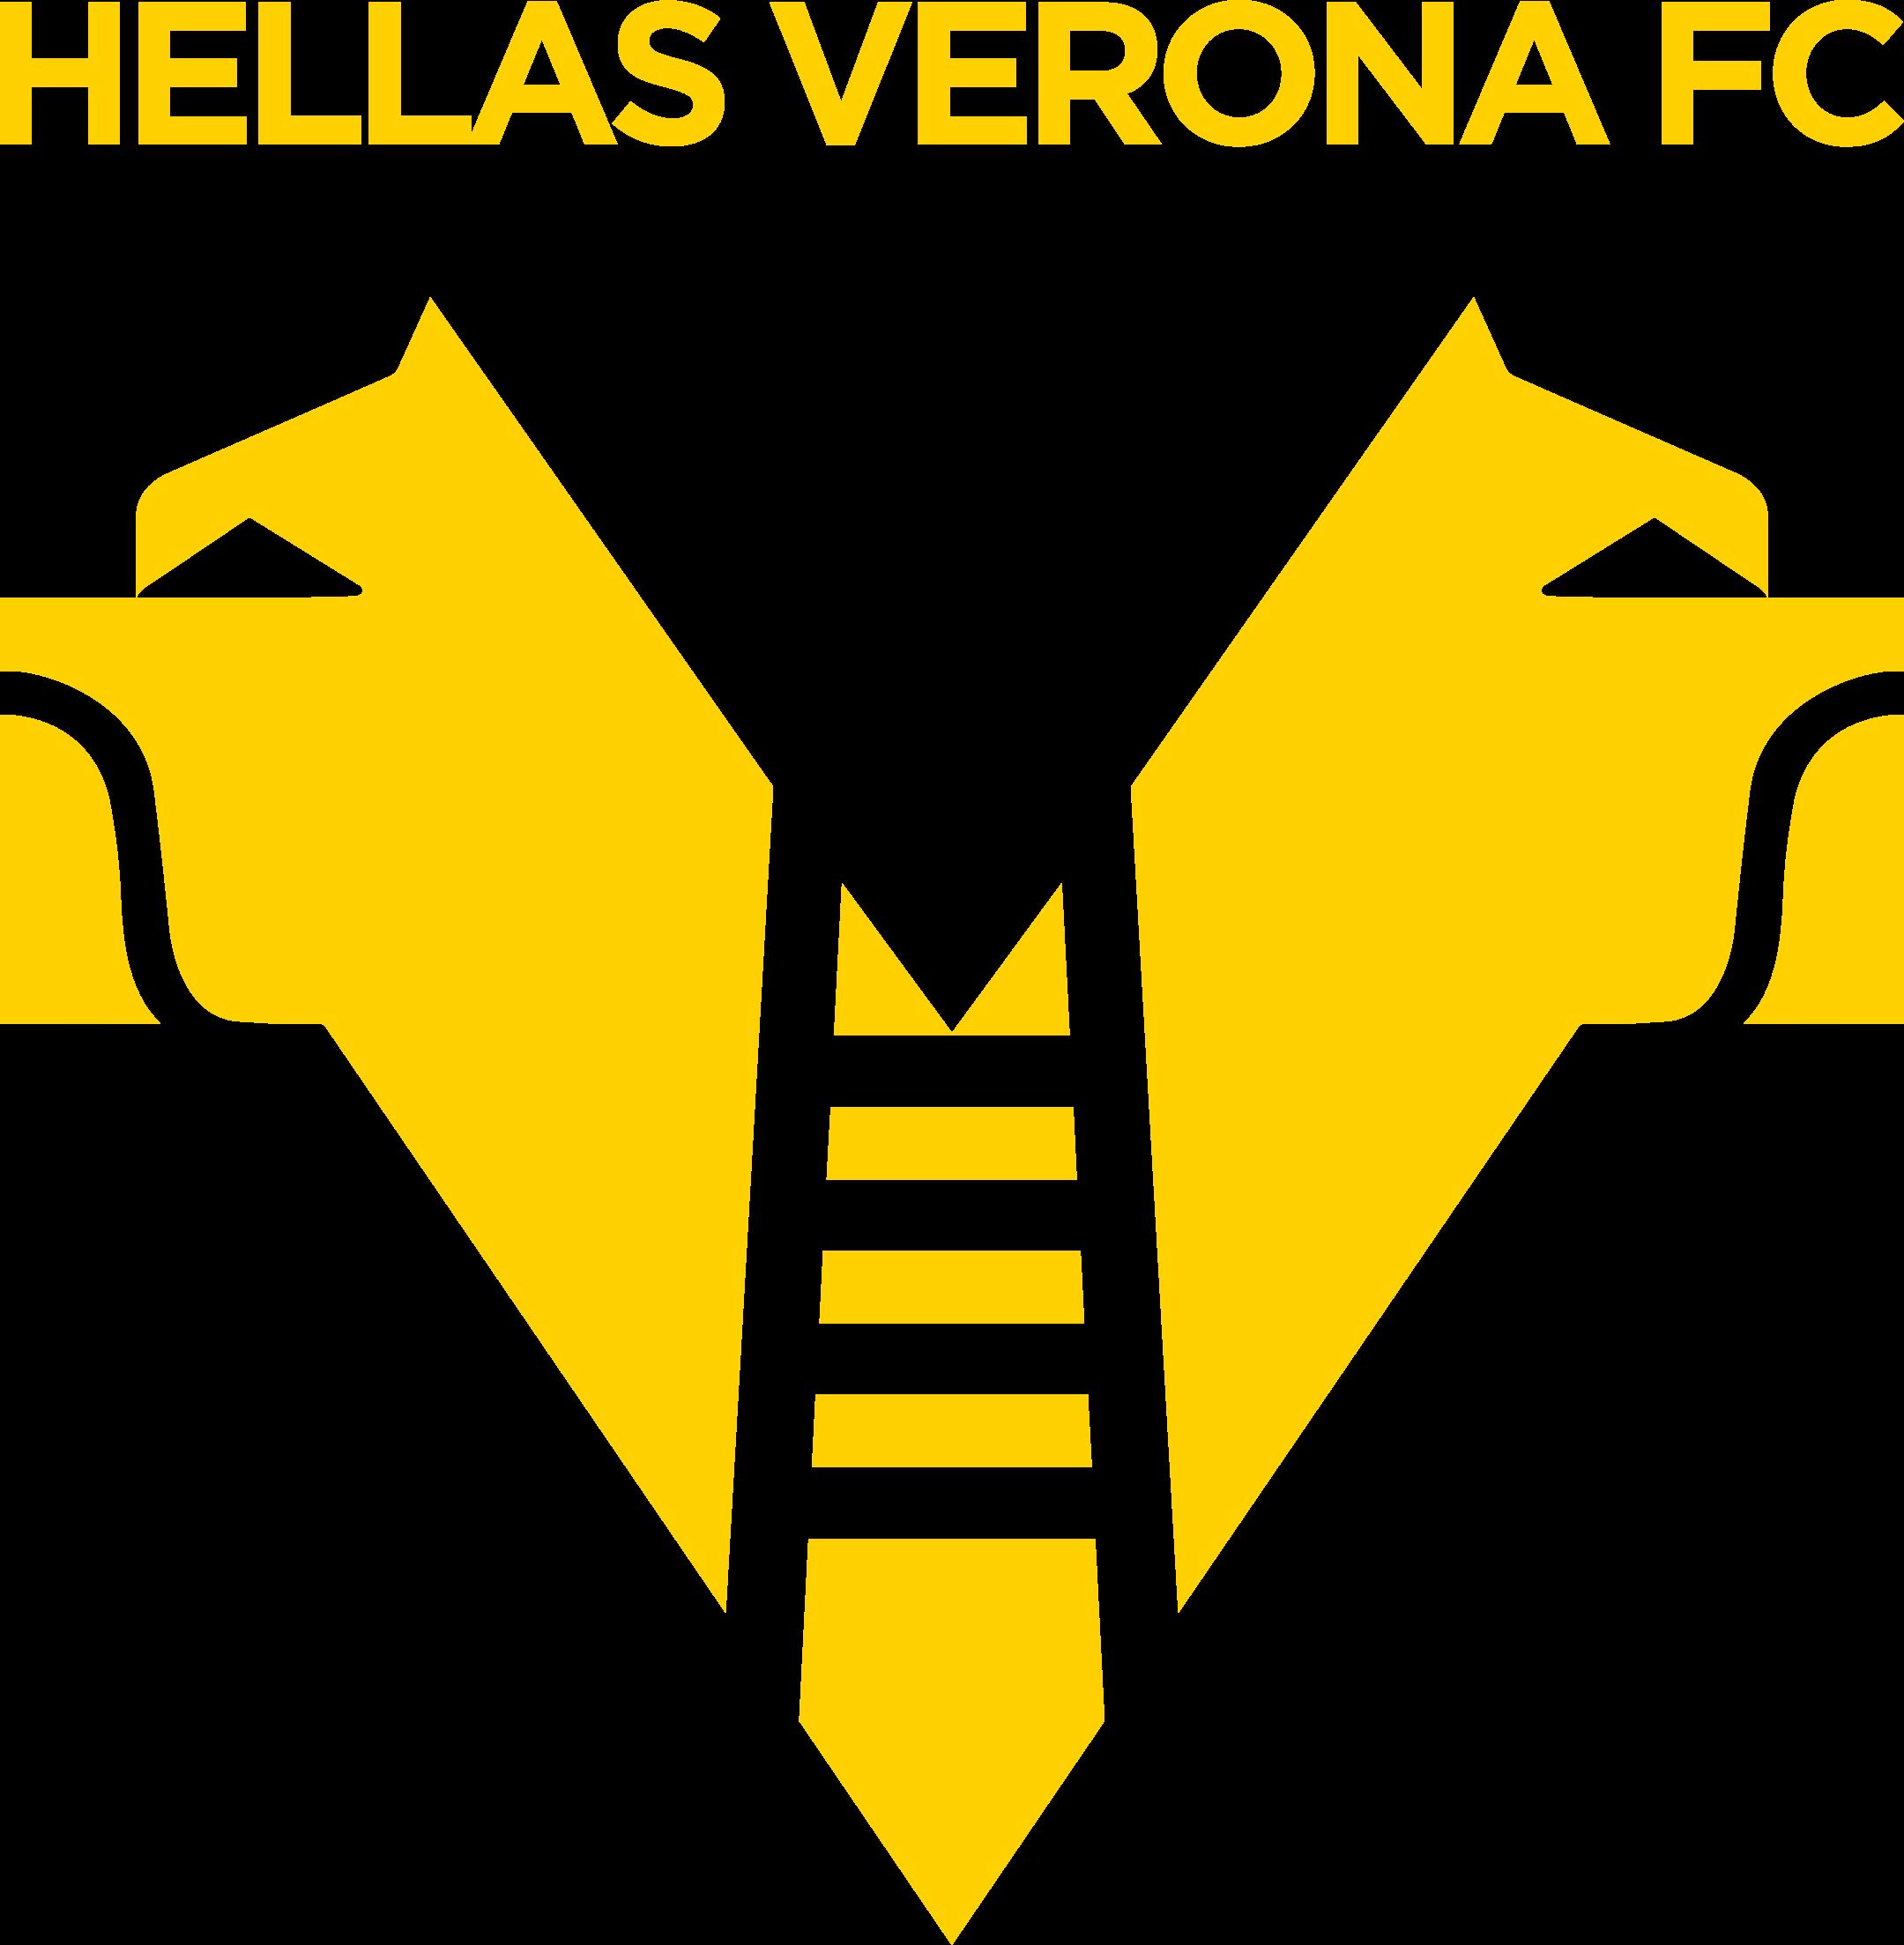 hellas verona fc logo 1 - Hellas Verona FC Logo